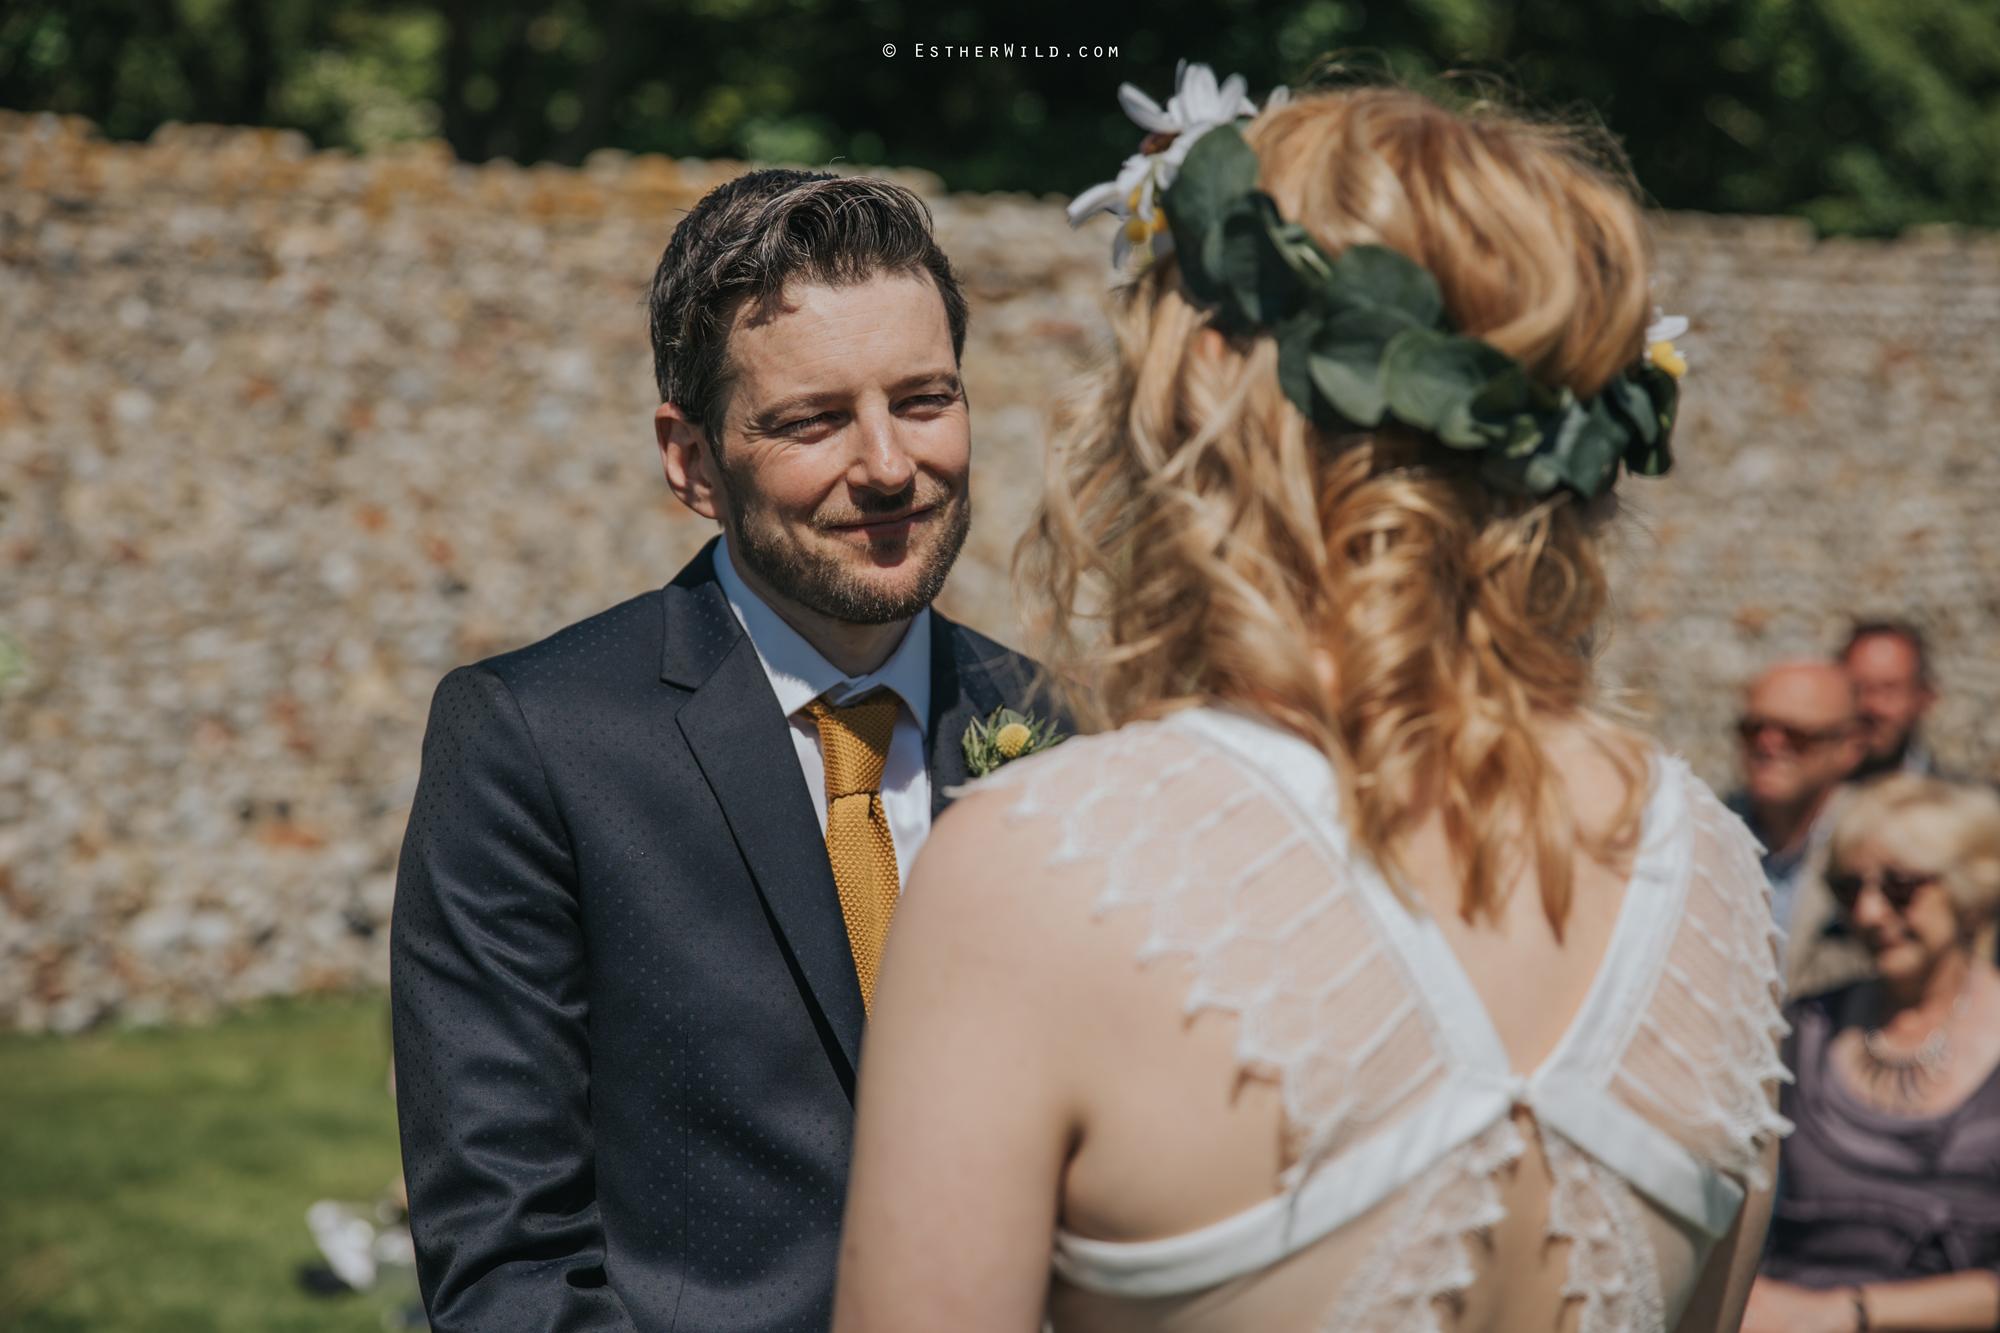 IMG_0521Cley_Barn_Drift_Norfolk_Coast_Wedding_Copyright_Esther_Wild_Photographer_.jpg